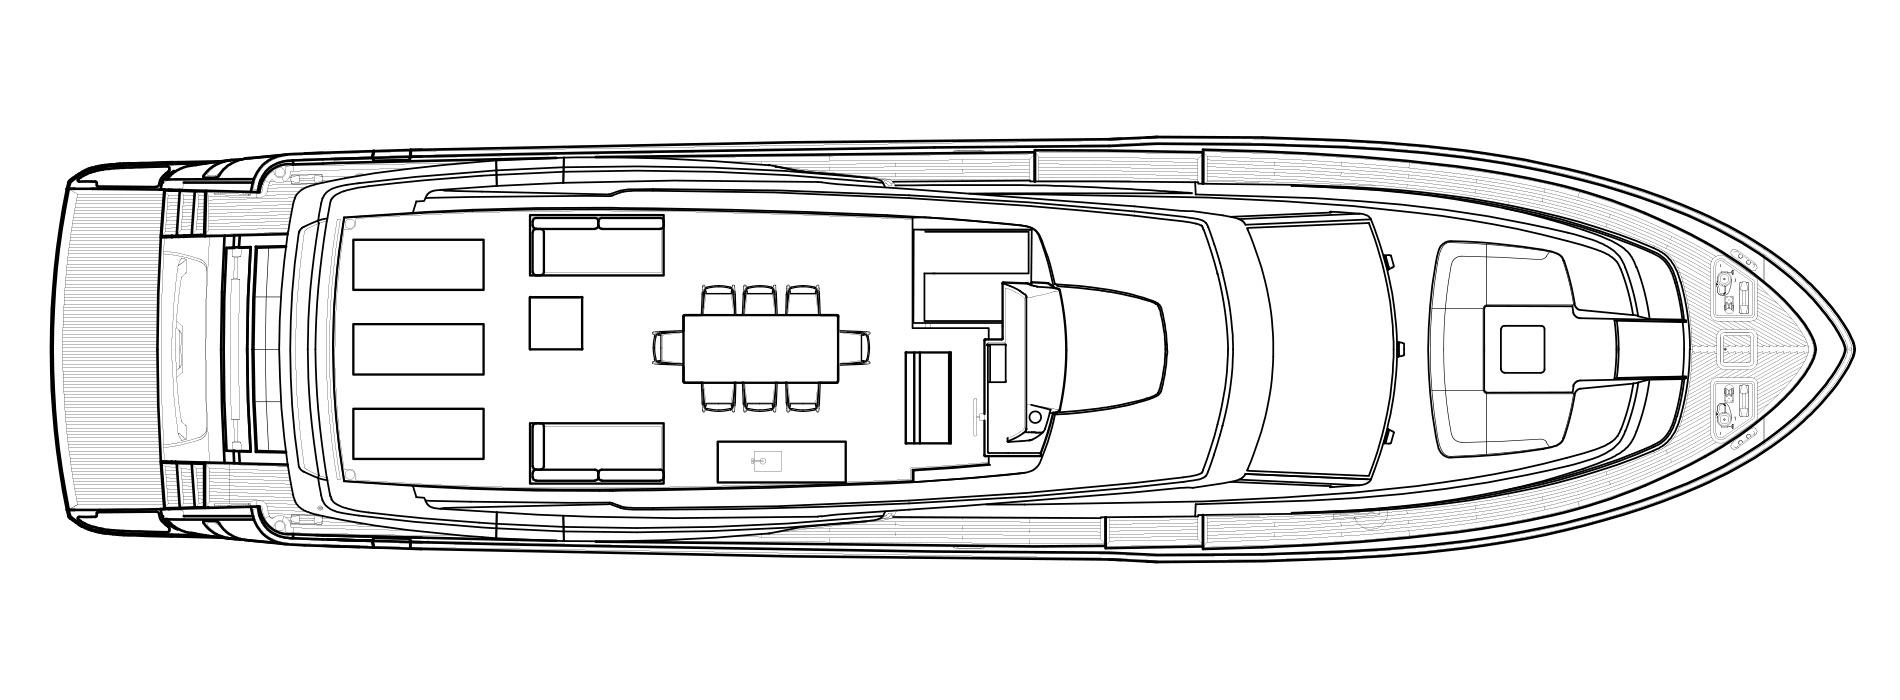 Sanlorenzo Yachts SL86 Flying bridge Version USA